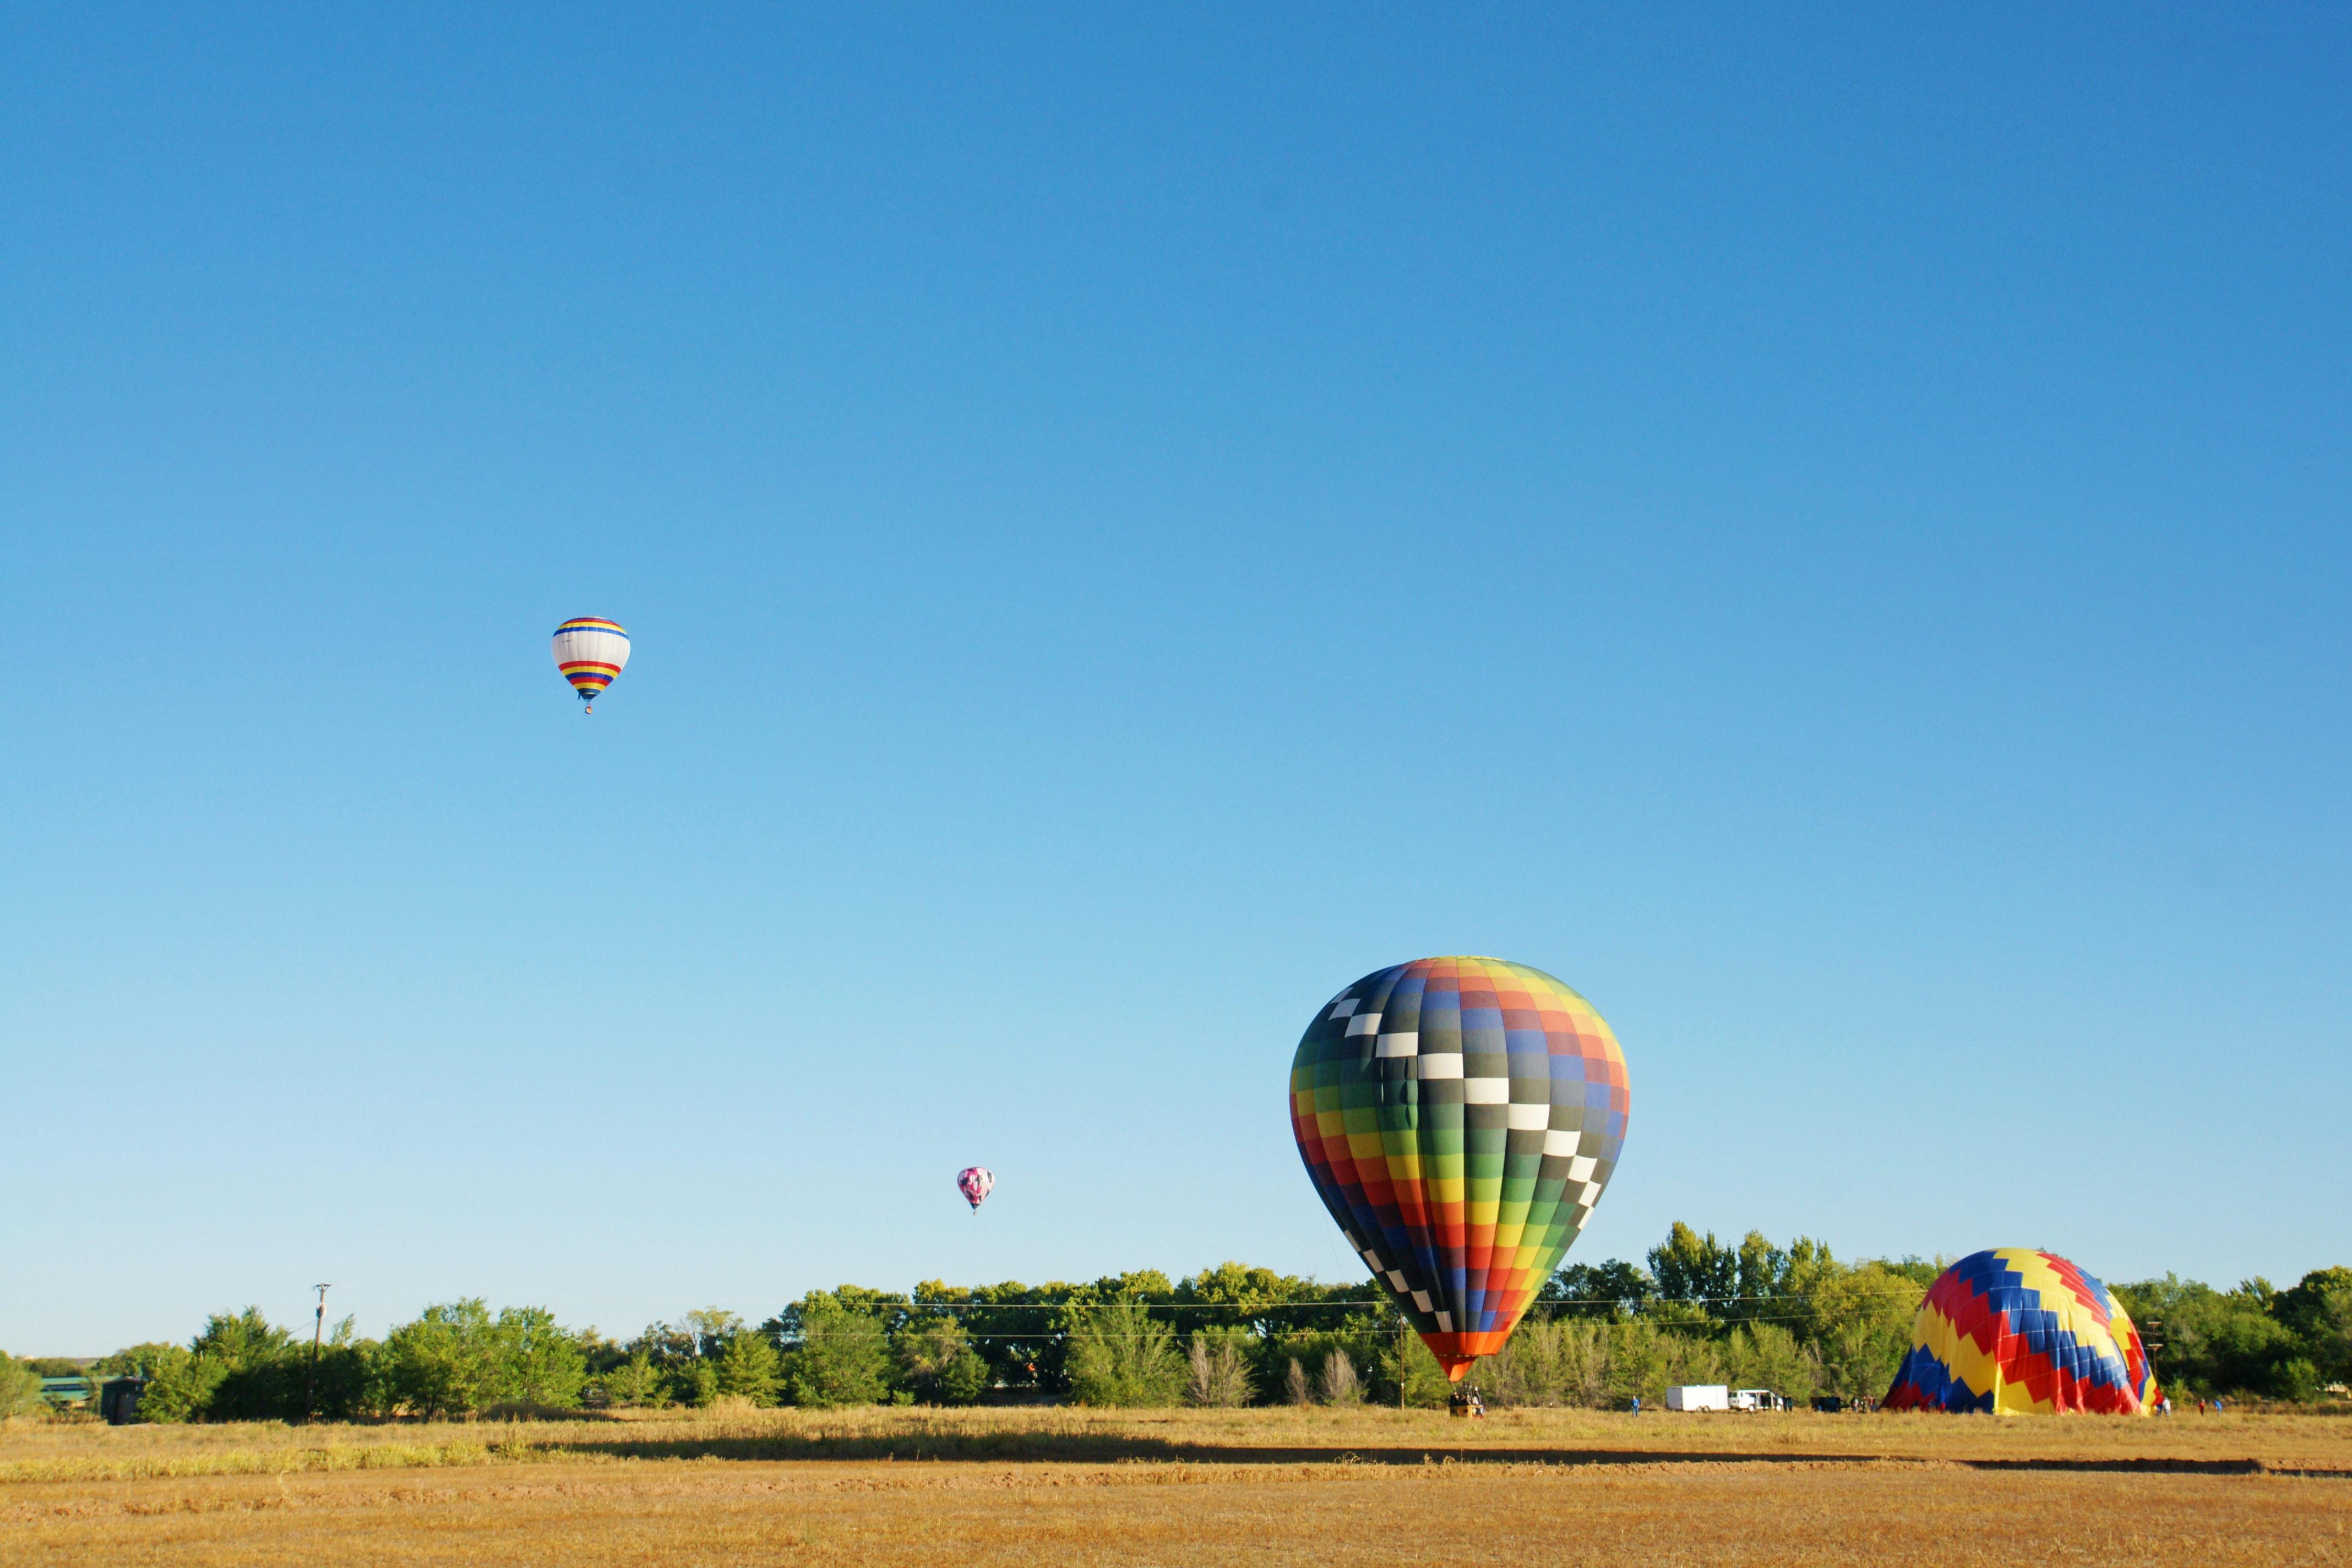 aibf-Balloon-Descent-Gallery12